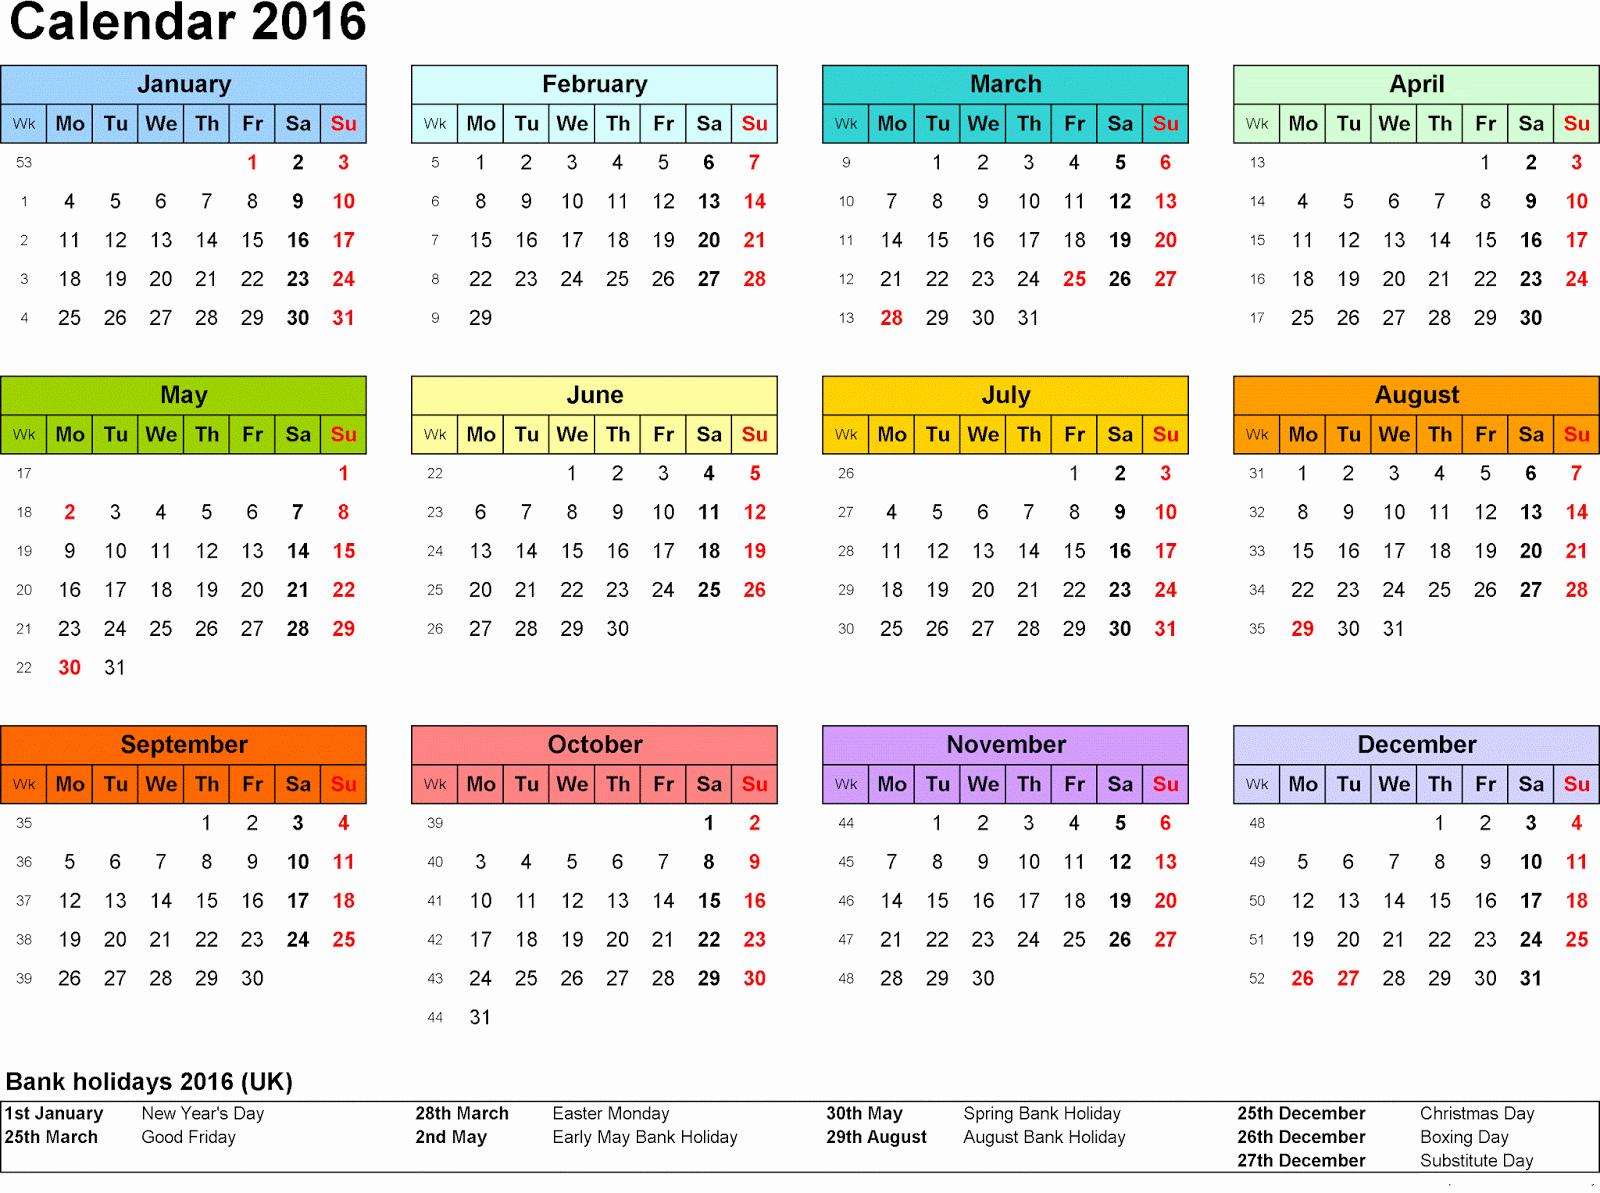 Free Printable Calendar 2016 Templates Elegant [free] Printable Calendar Templates 2016